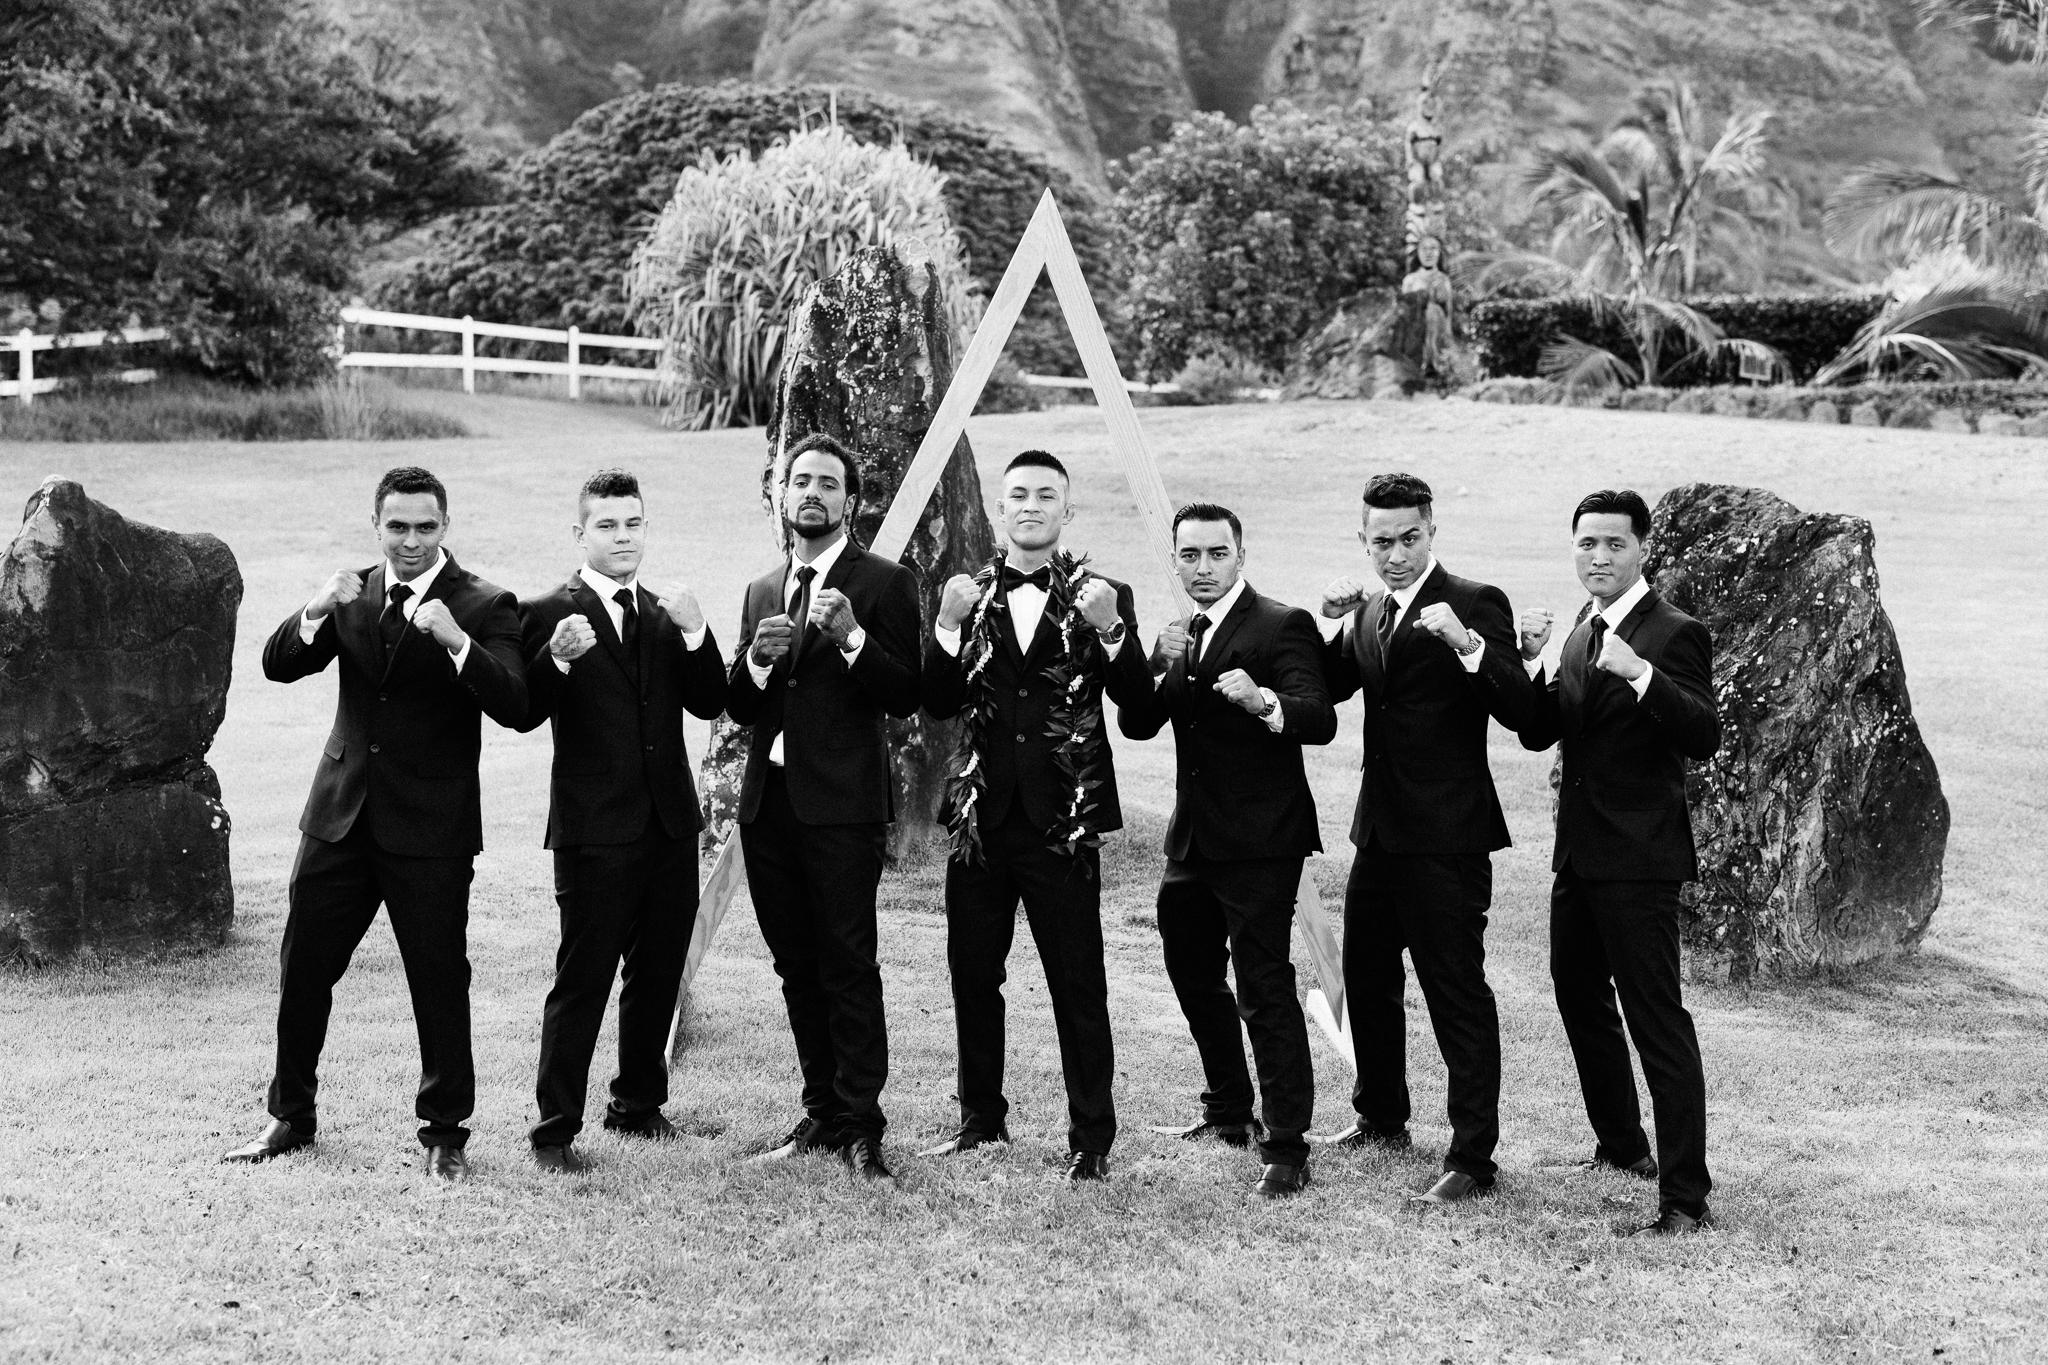 Kualoa_Ranch_Wedding_Photographer_Tone_Hawaii-26.jpg